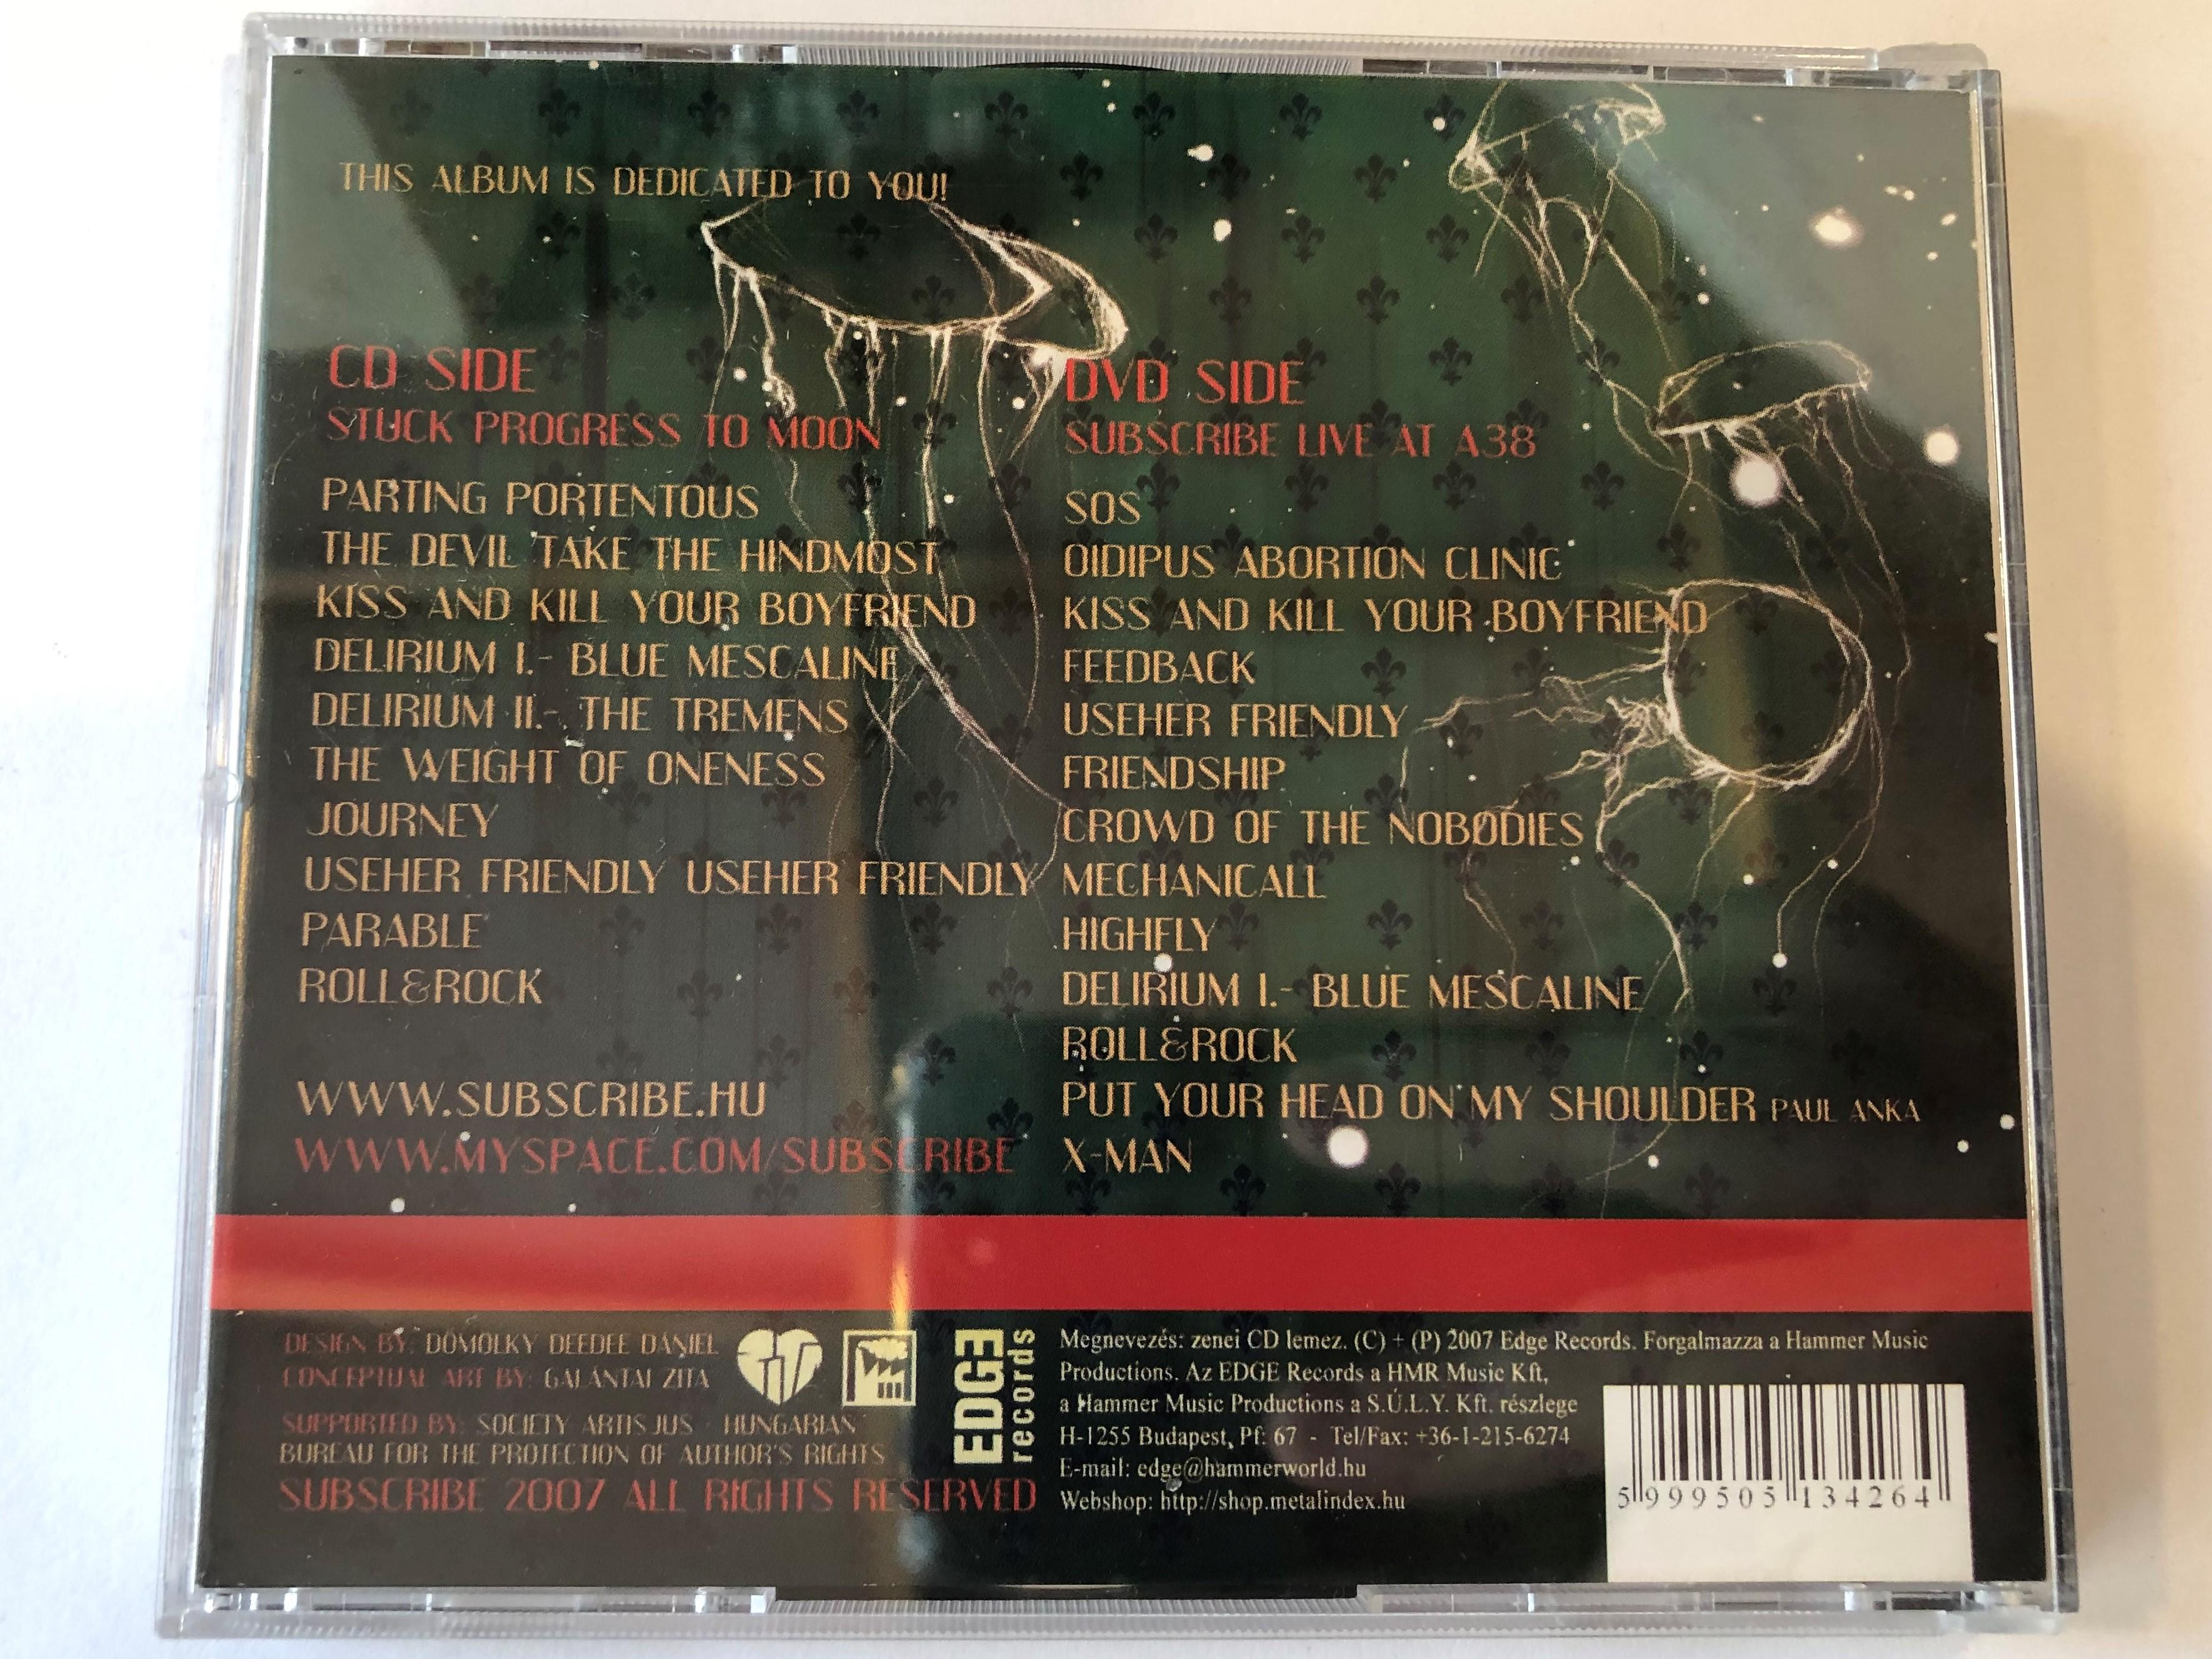 subscribe-stuck-progress-to-moon-edge-records-audio-cd-2007-5999505134264-2-.jpg